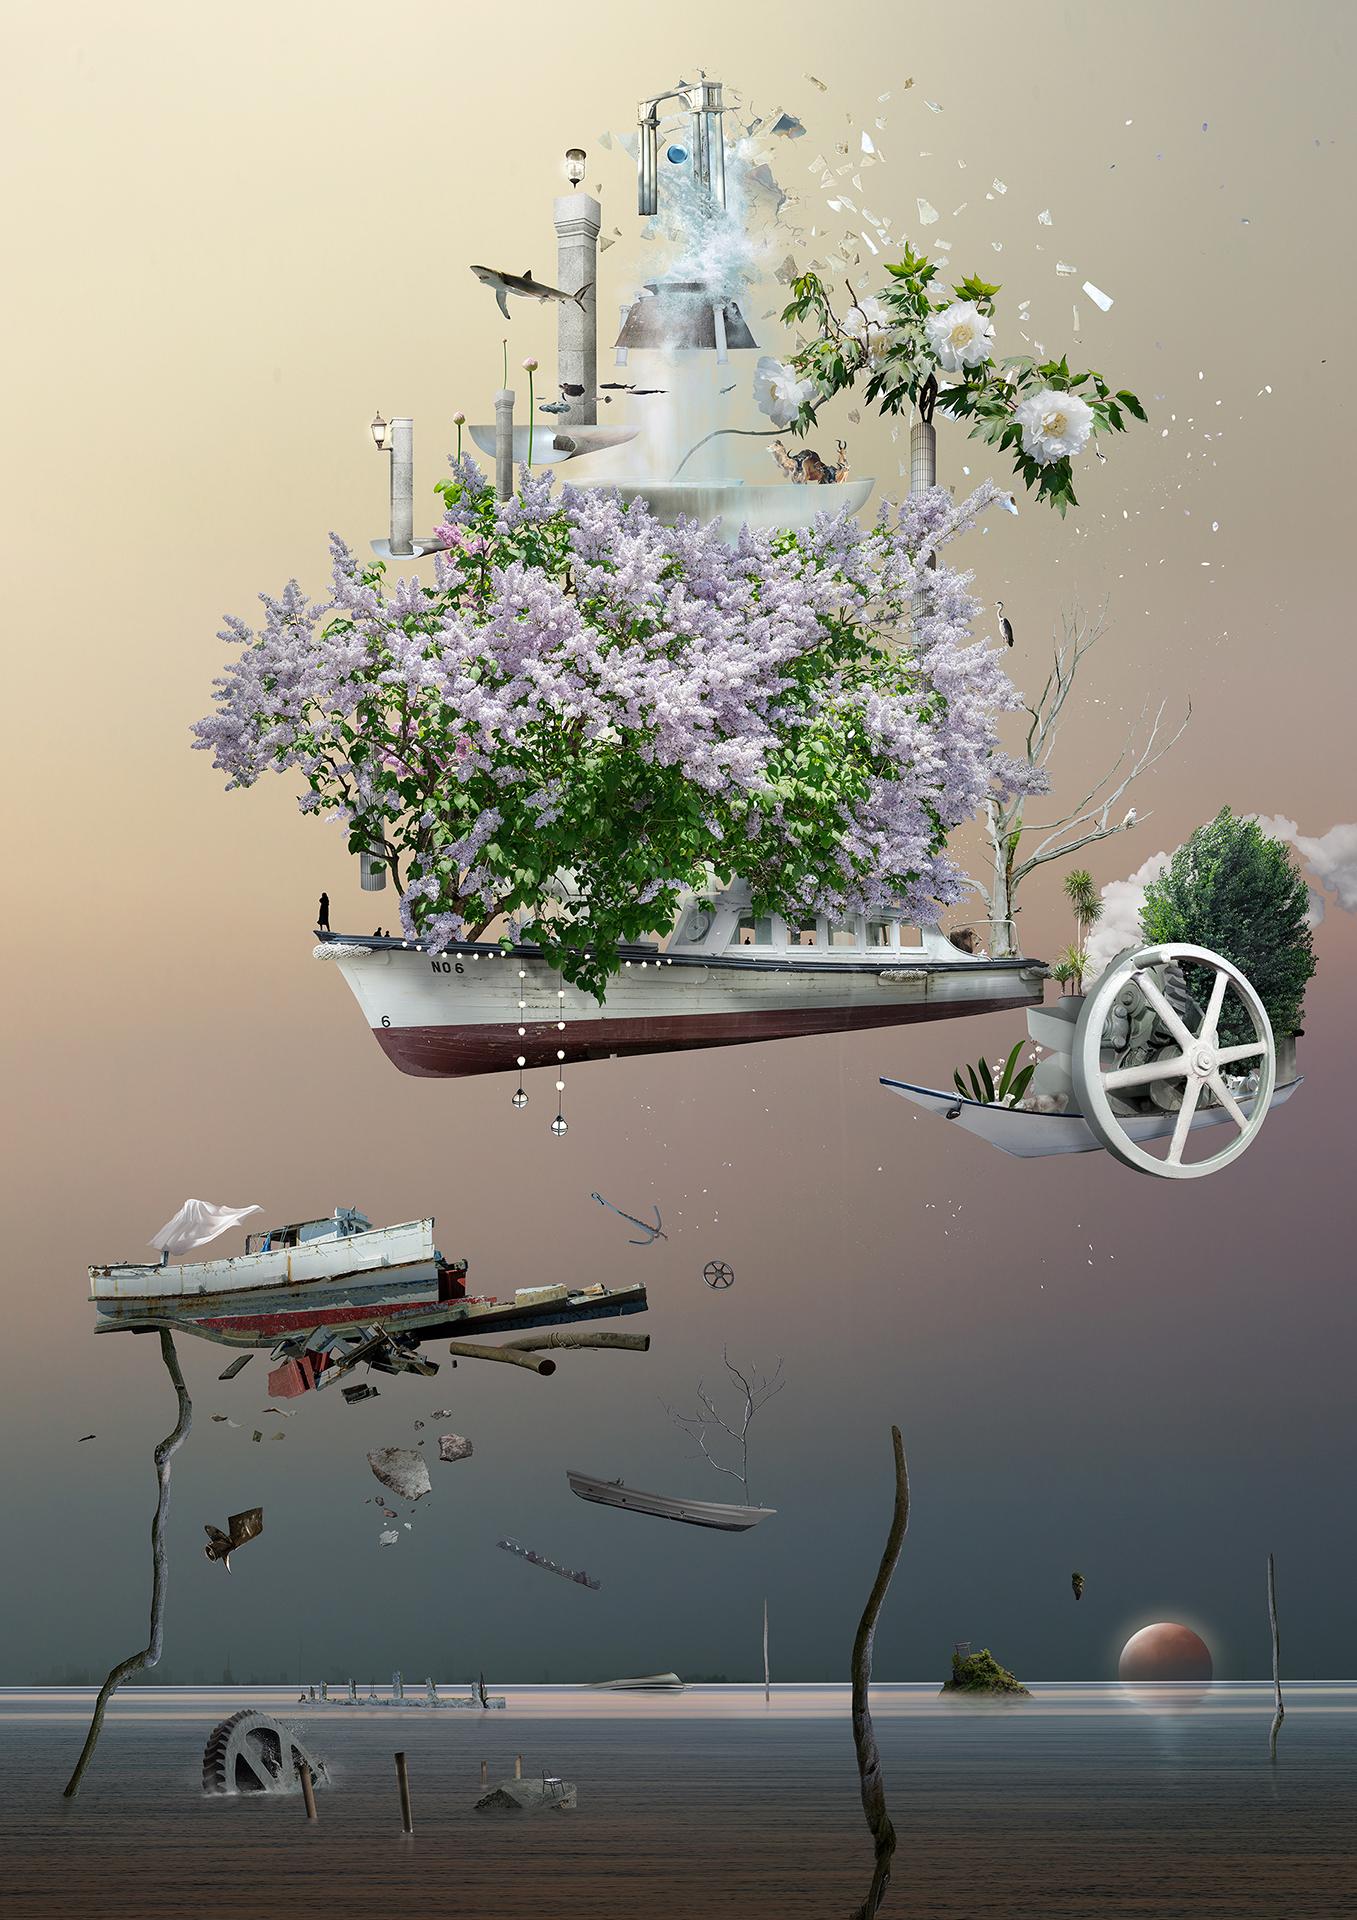 Series:Celebration of embarkation